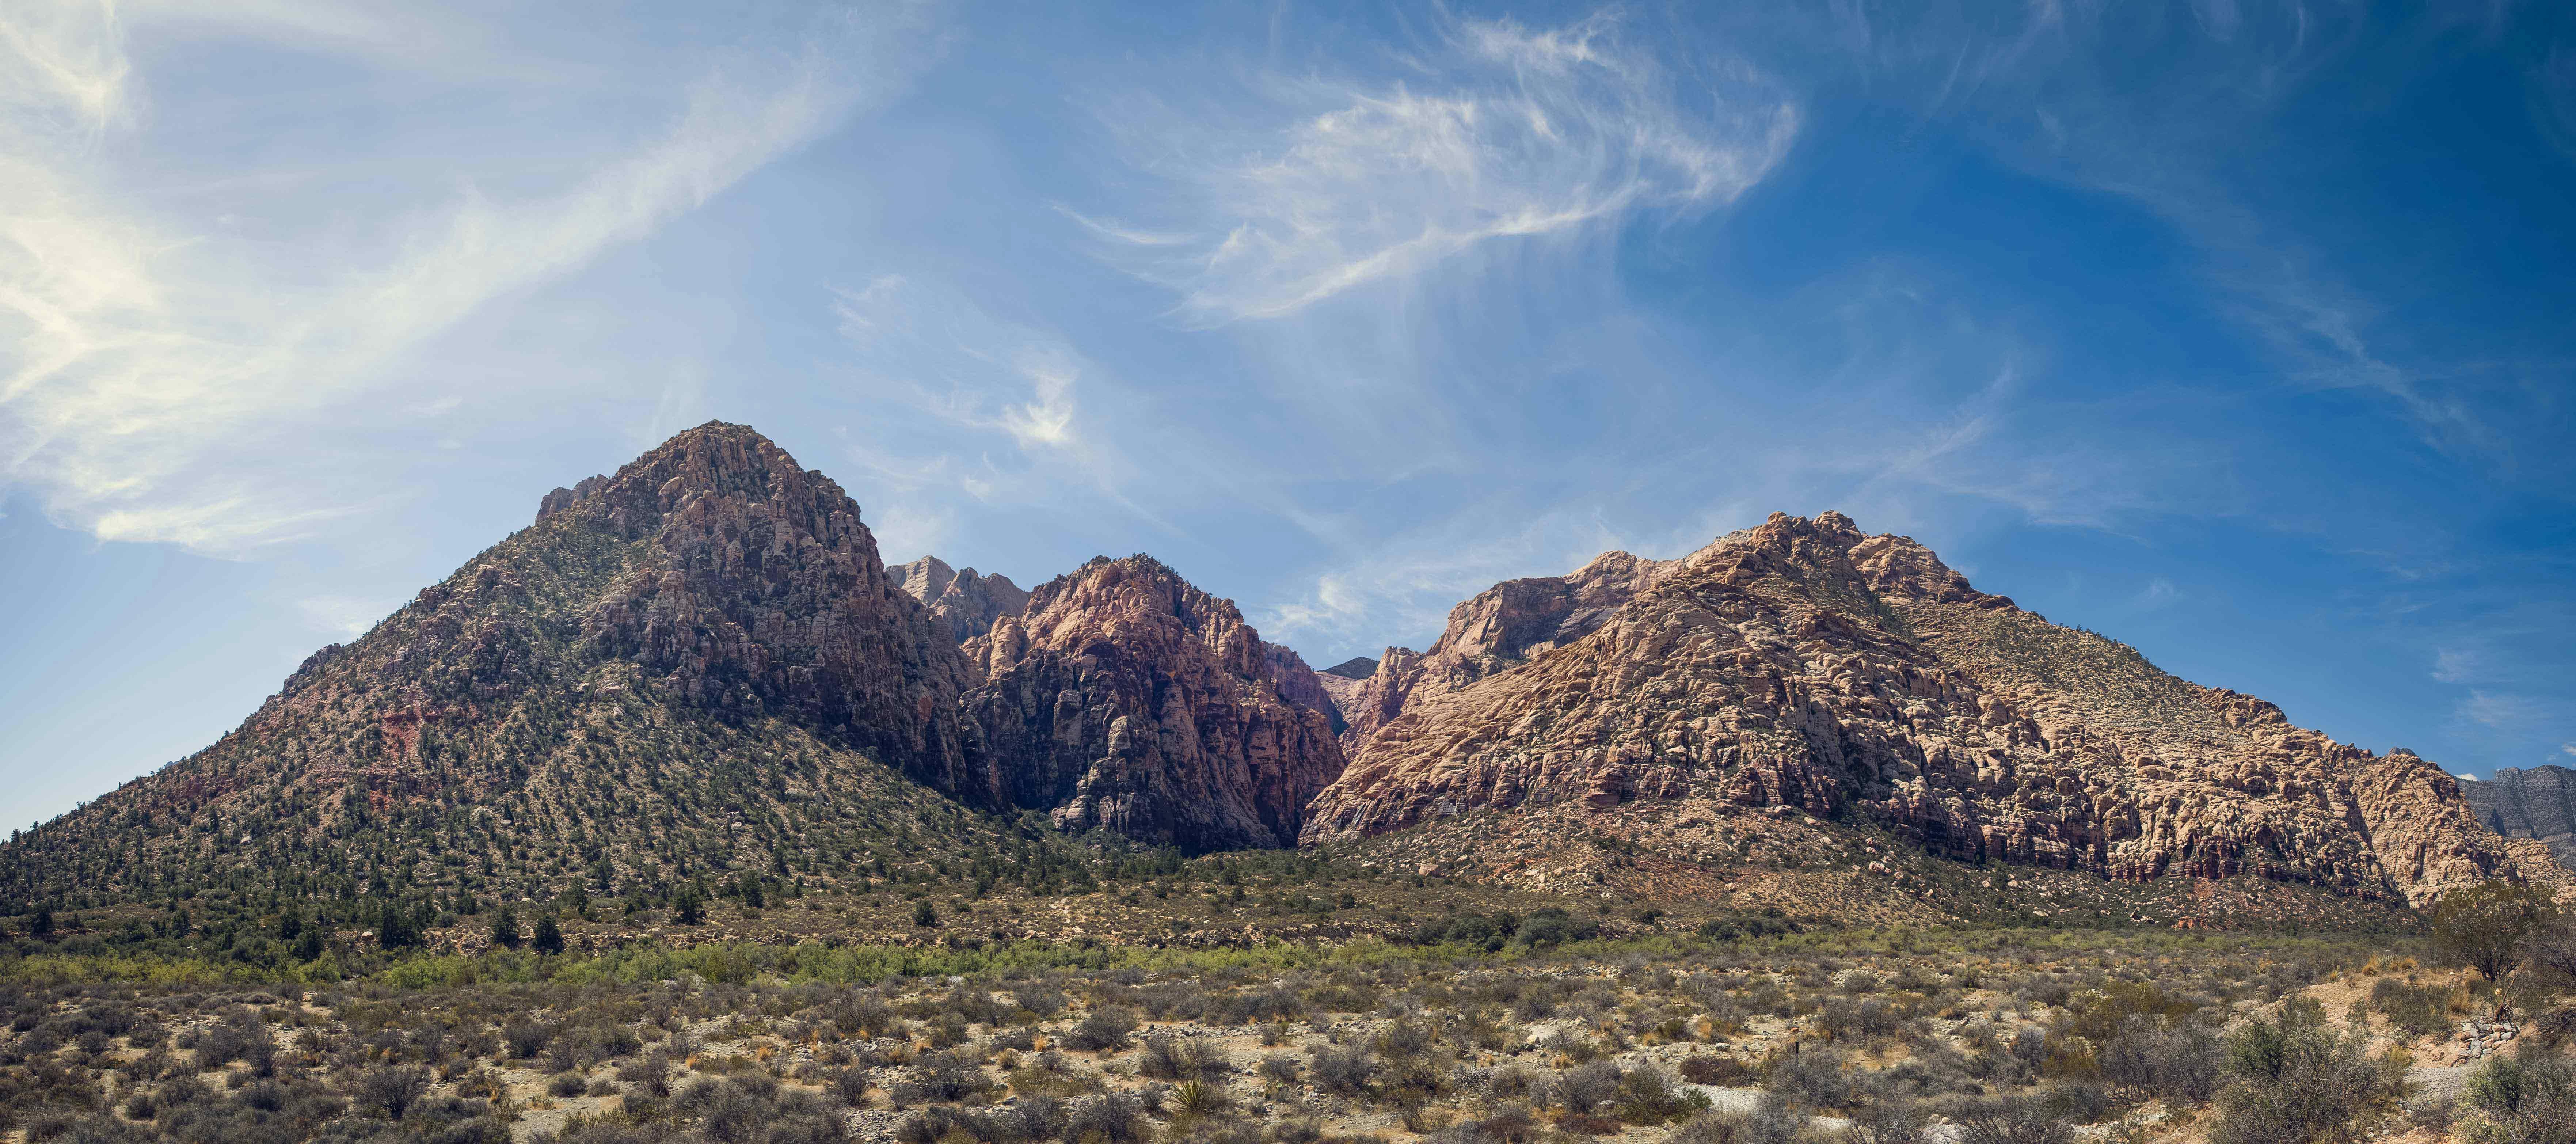 red rock canyon Californie Death valley vallée de la mort Las Vegas Los Angeles San Francisco blog carnet de voyage désert montagnes